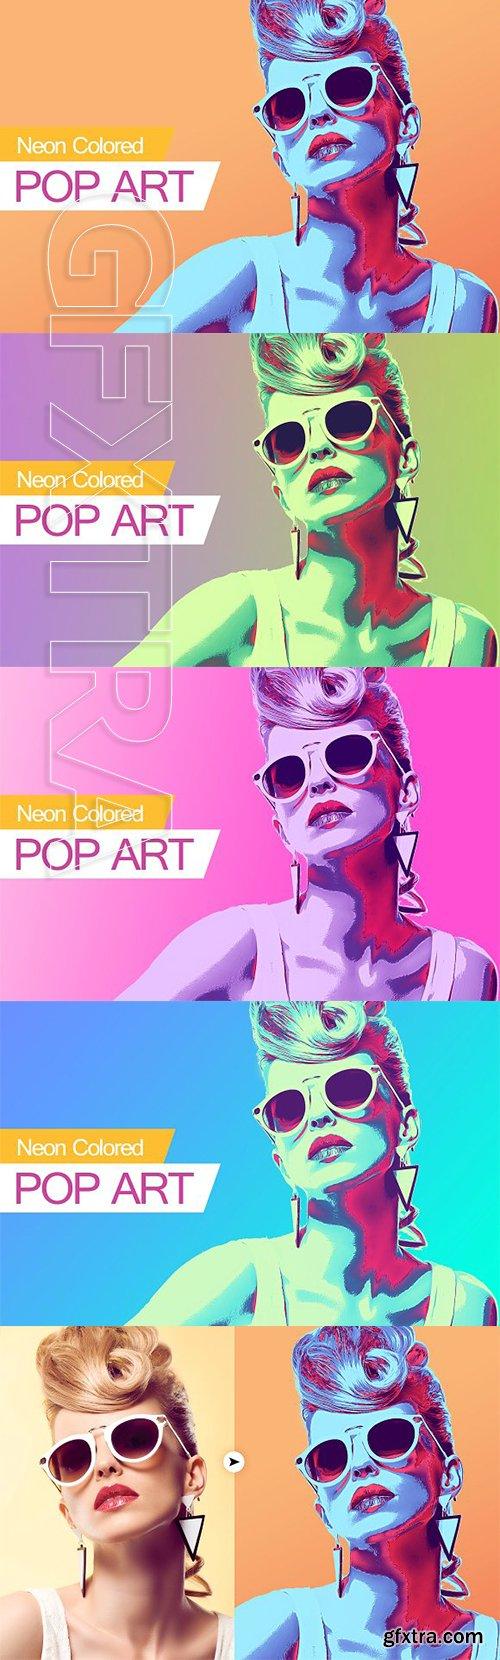 CreativeMarket - Neon Colored POP ART 3303295